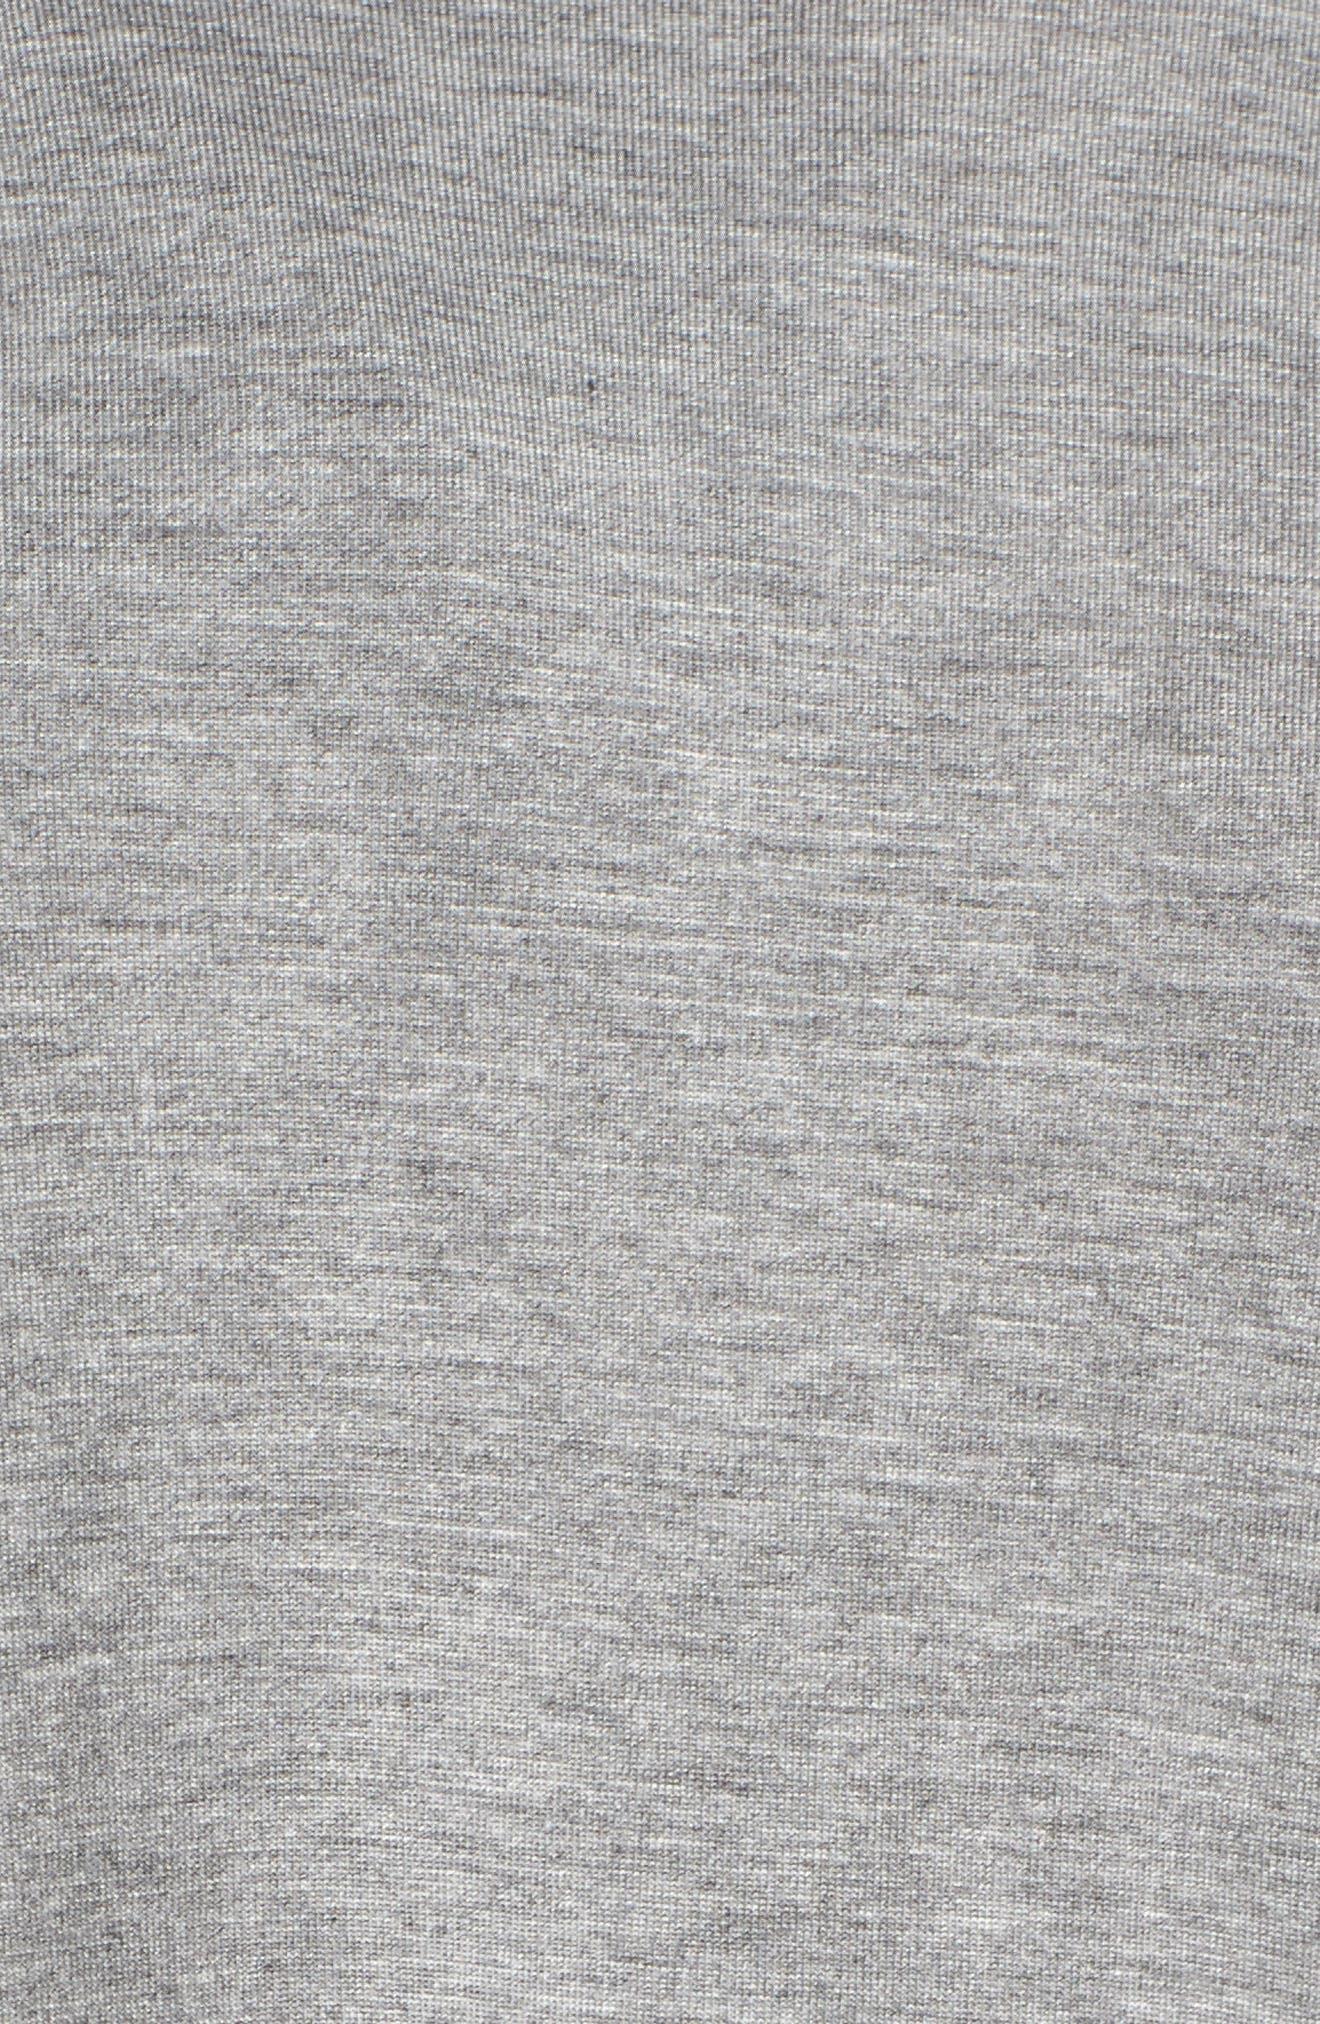 Honeydew All American Sleep Shirt,                             Alternate thumbnail 30, color,